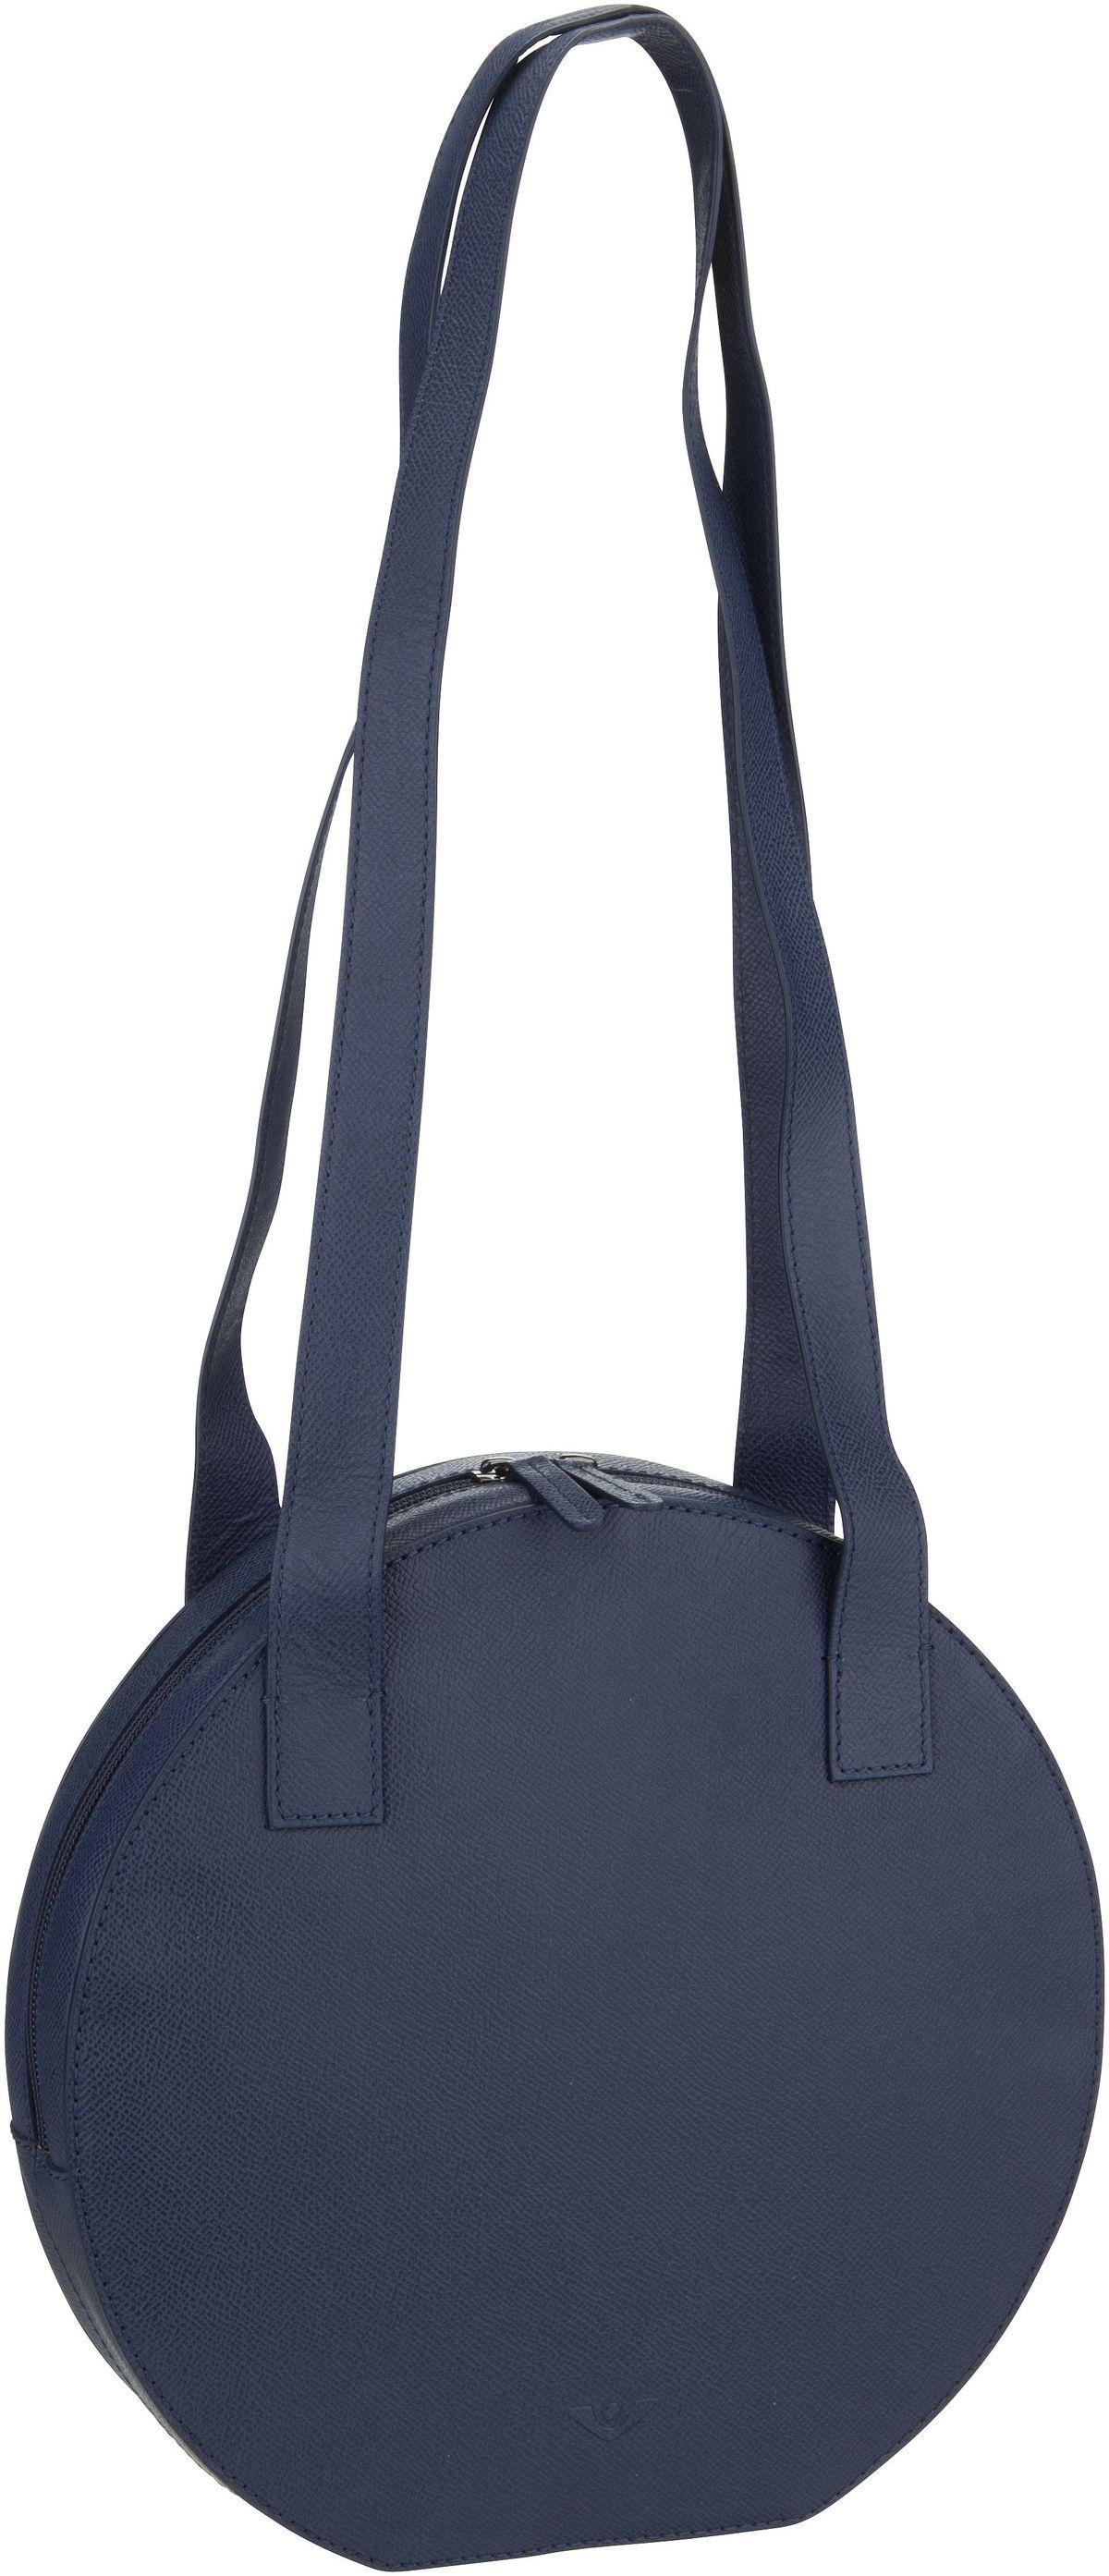 Voi Handtasche Classico 30603 Hobo Bag Blau